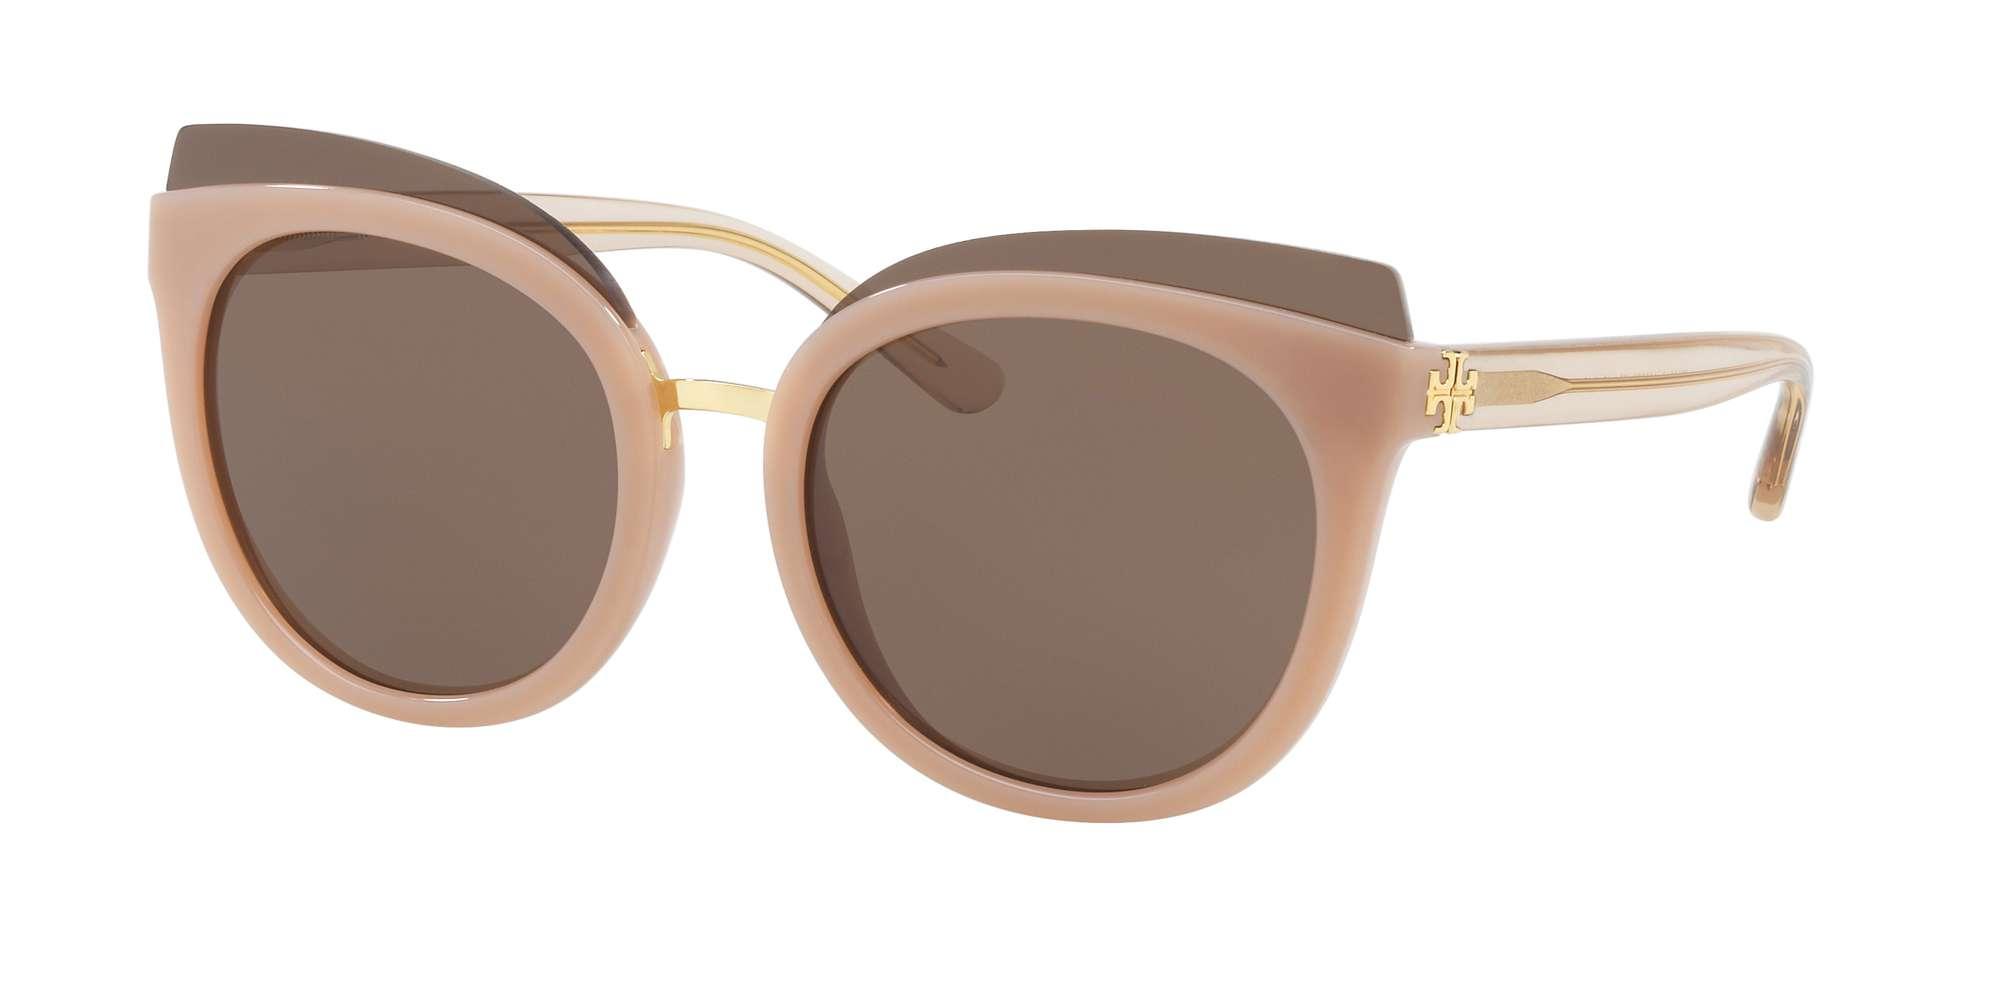 BLUSH / BROWN SOLID lenses